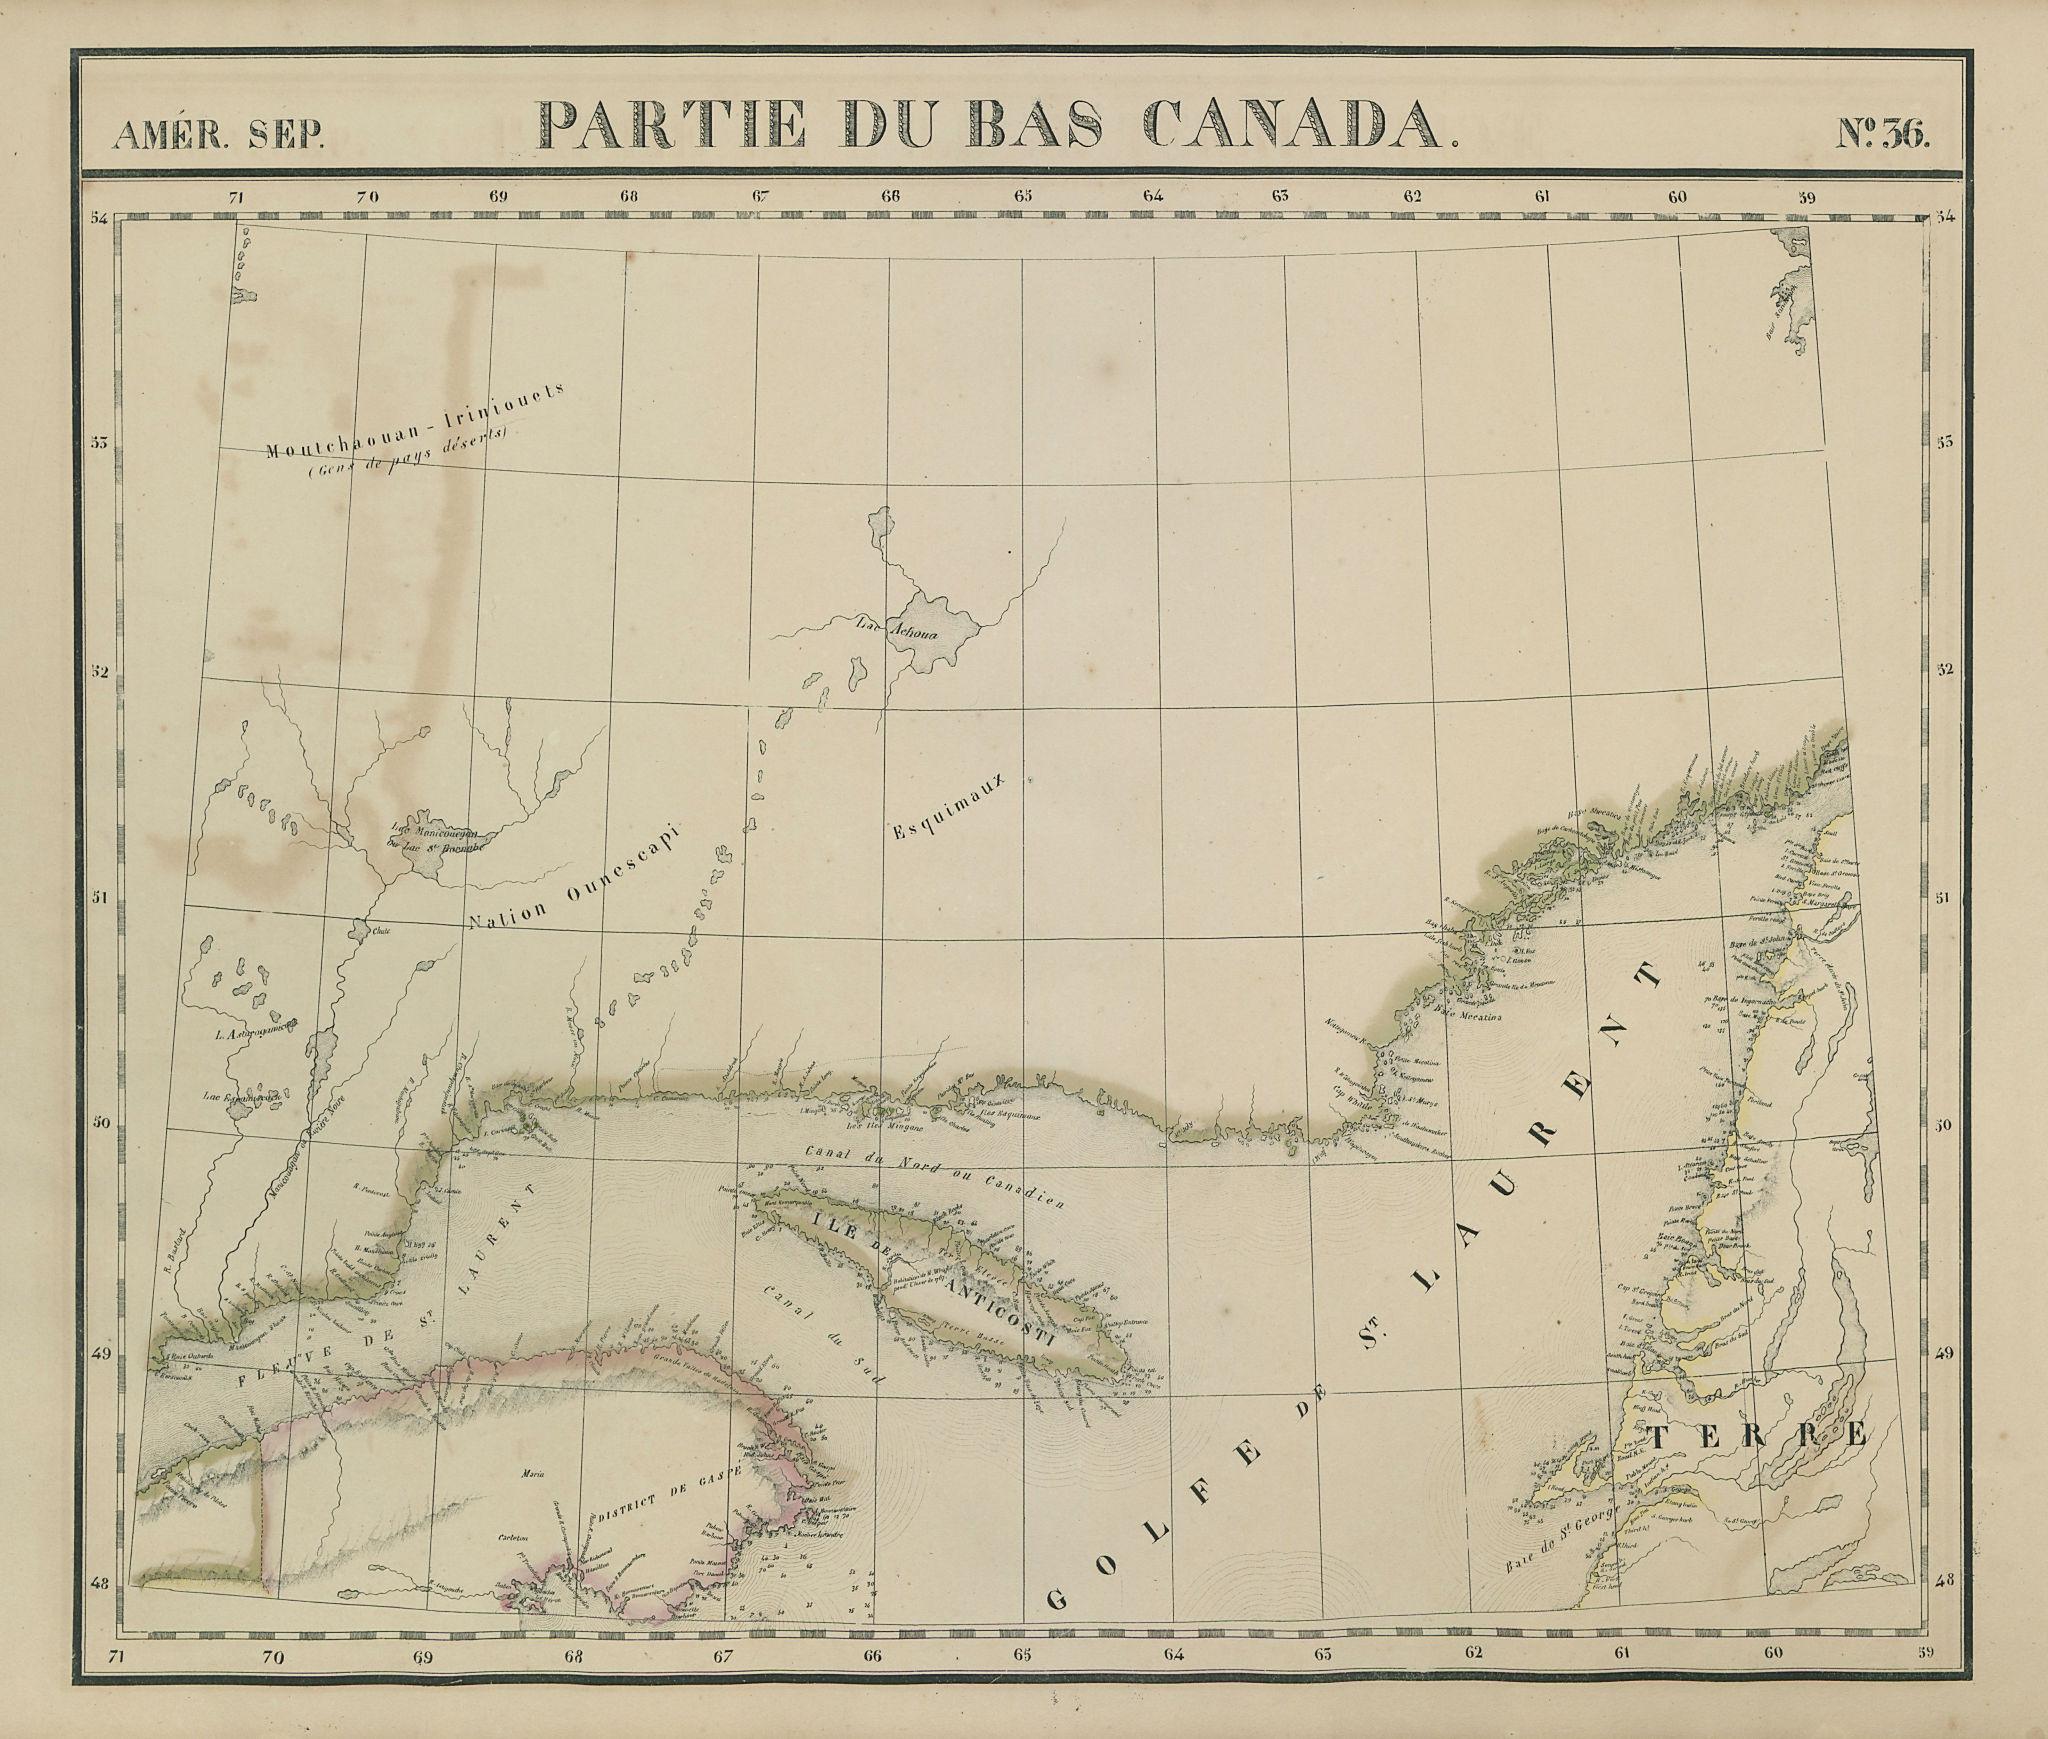 Amér. Sep. Partie du Bas Canada #36. Gulf of St Lawrence. VANDERMAELEN 1827 map